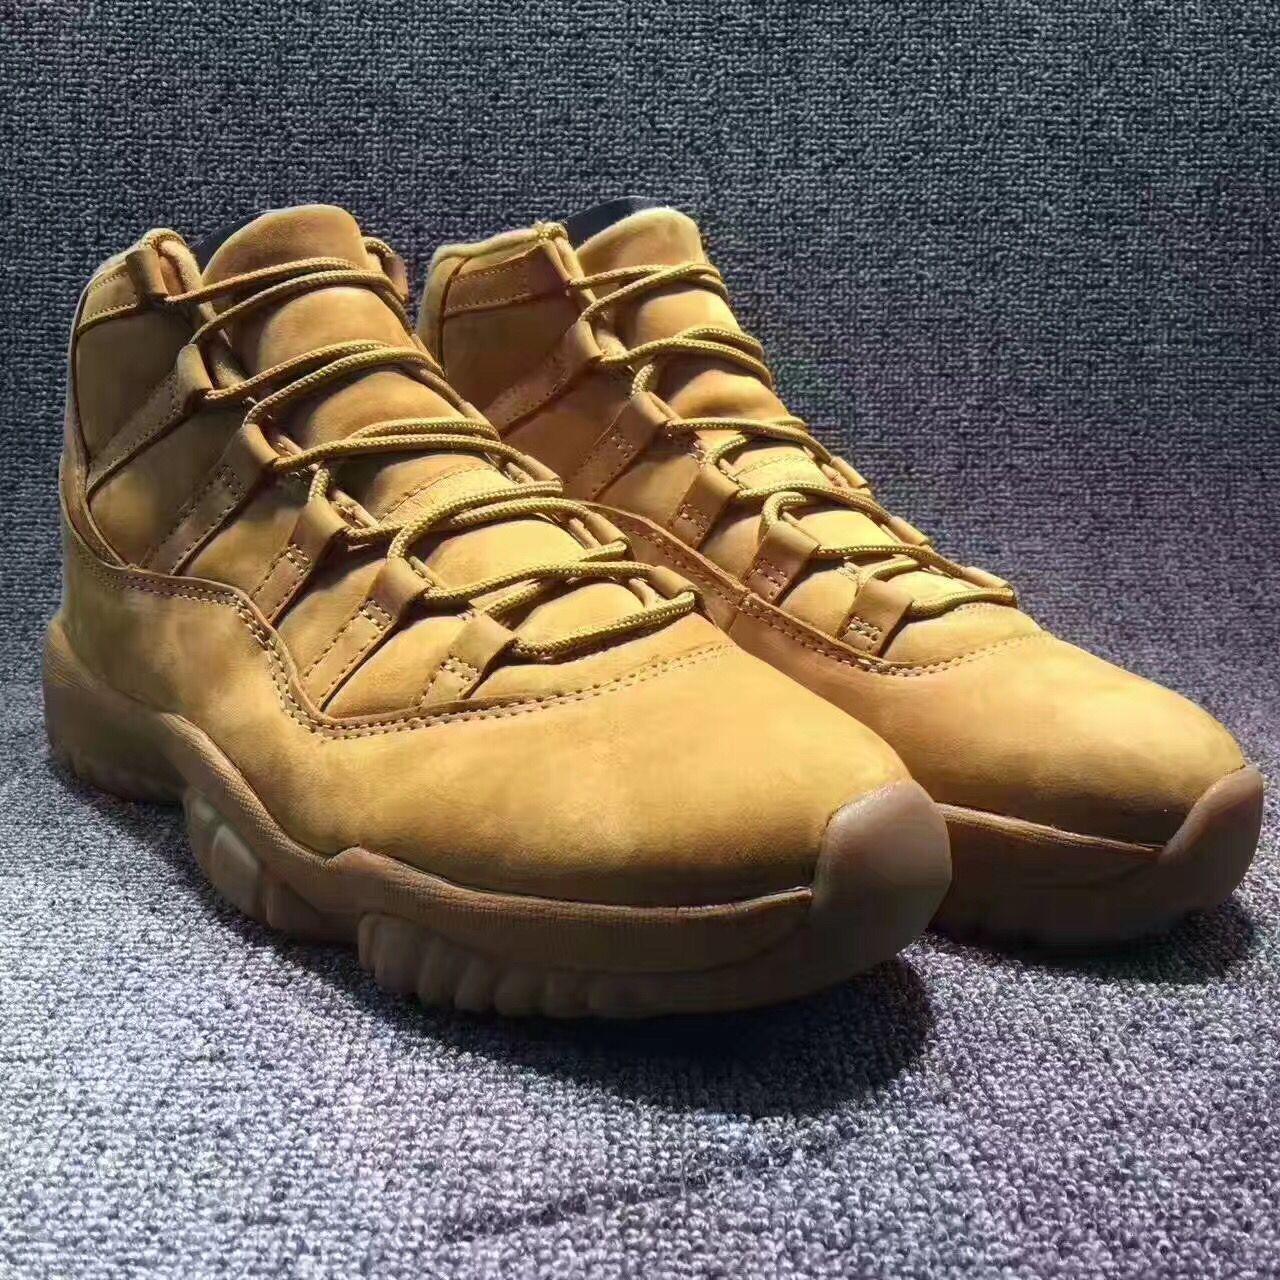 b7249f7c00f4 JB Might Be Releasing These Air Jordan 11 PSNY Wheat – Housakicks